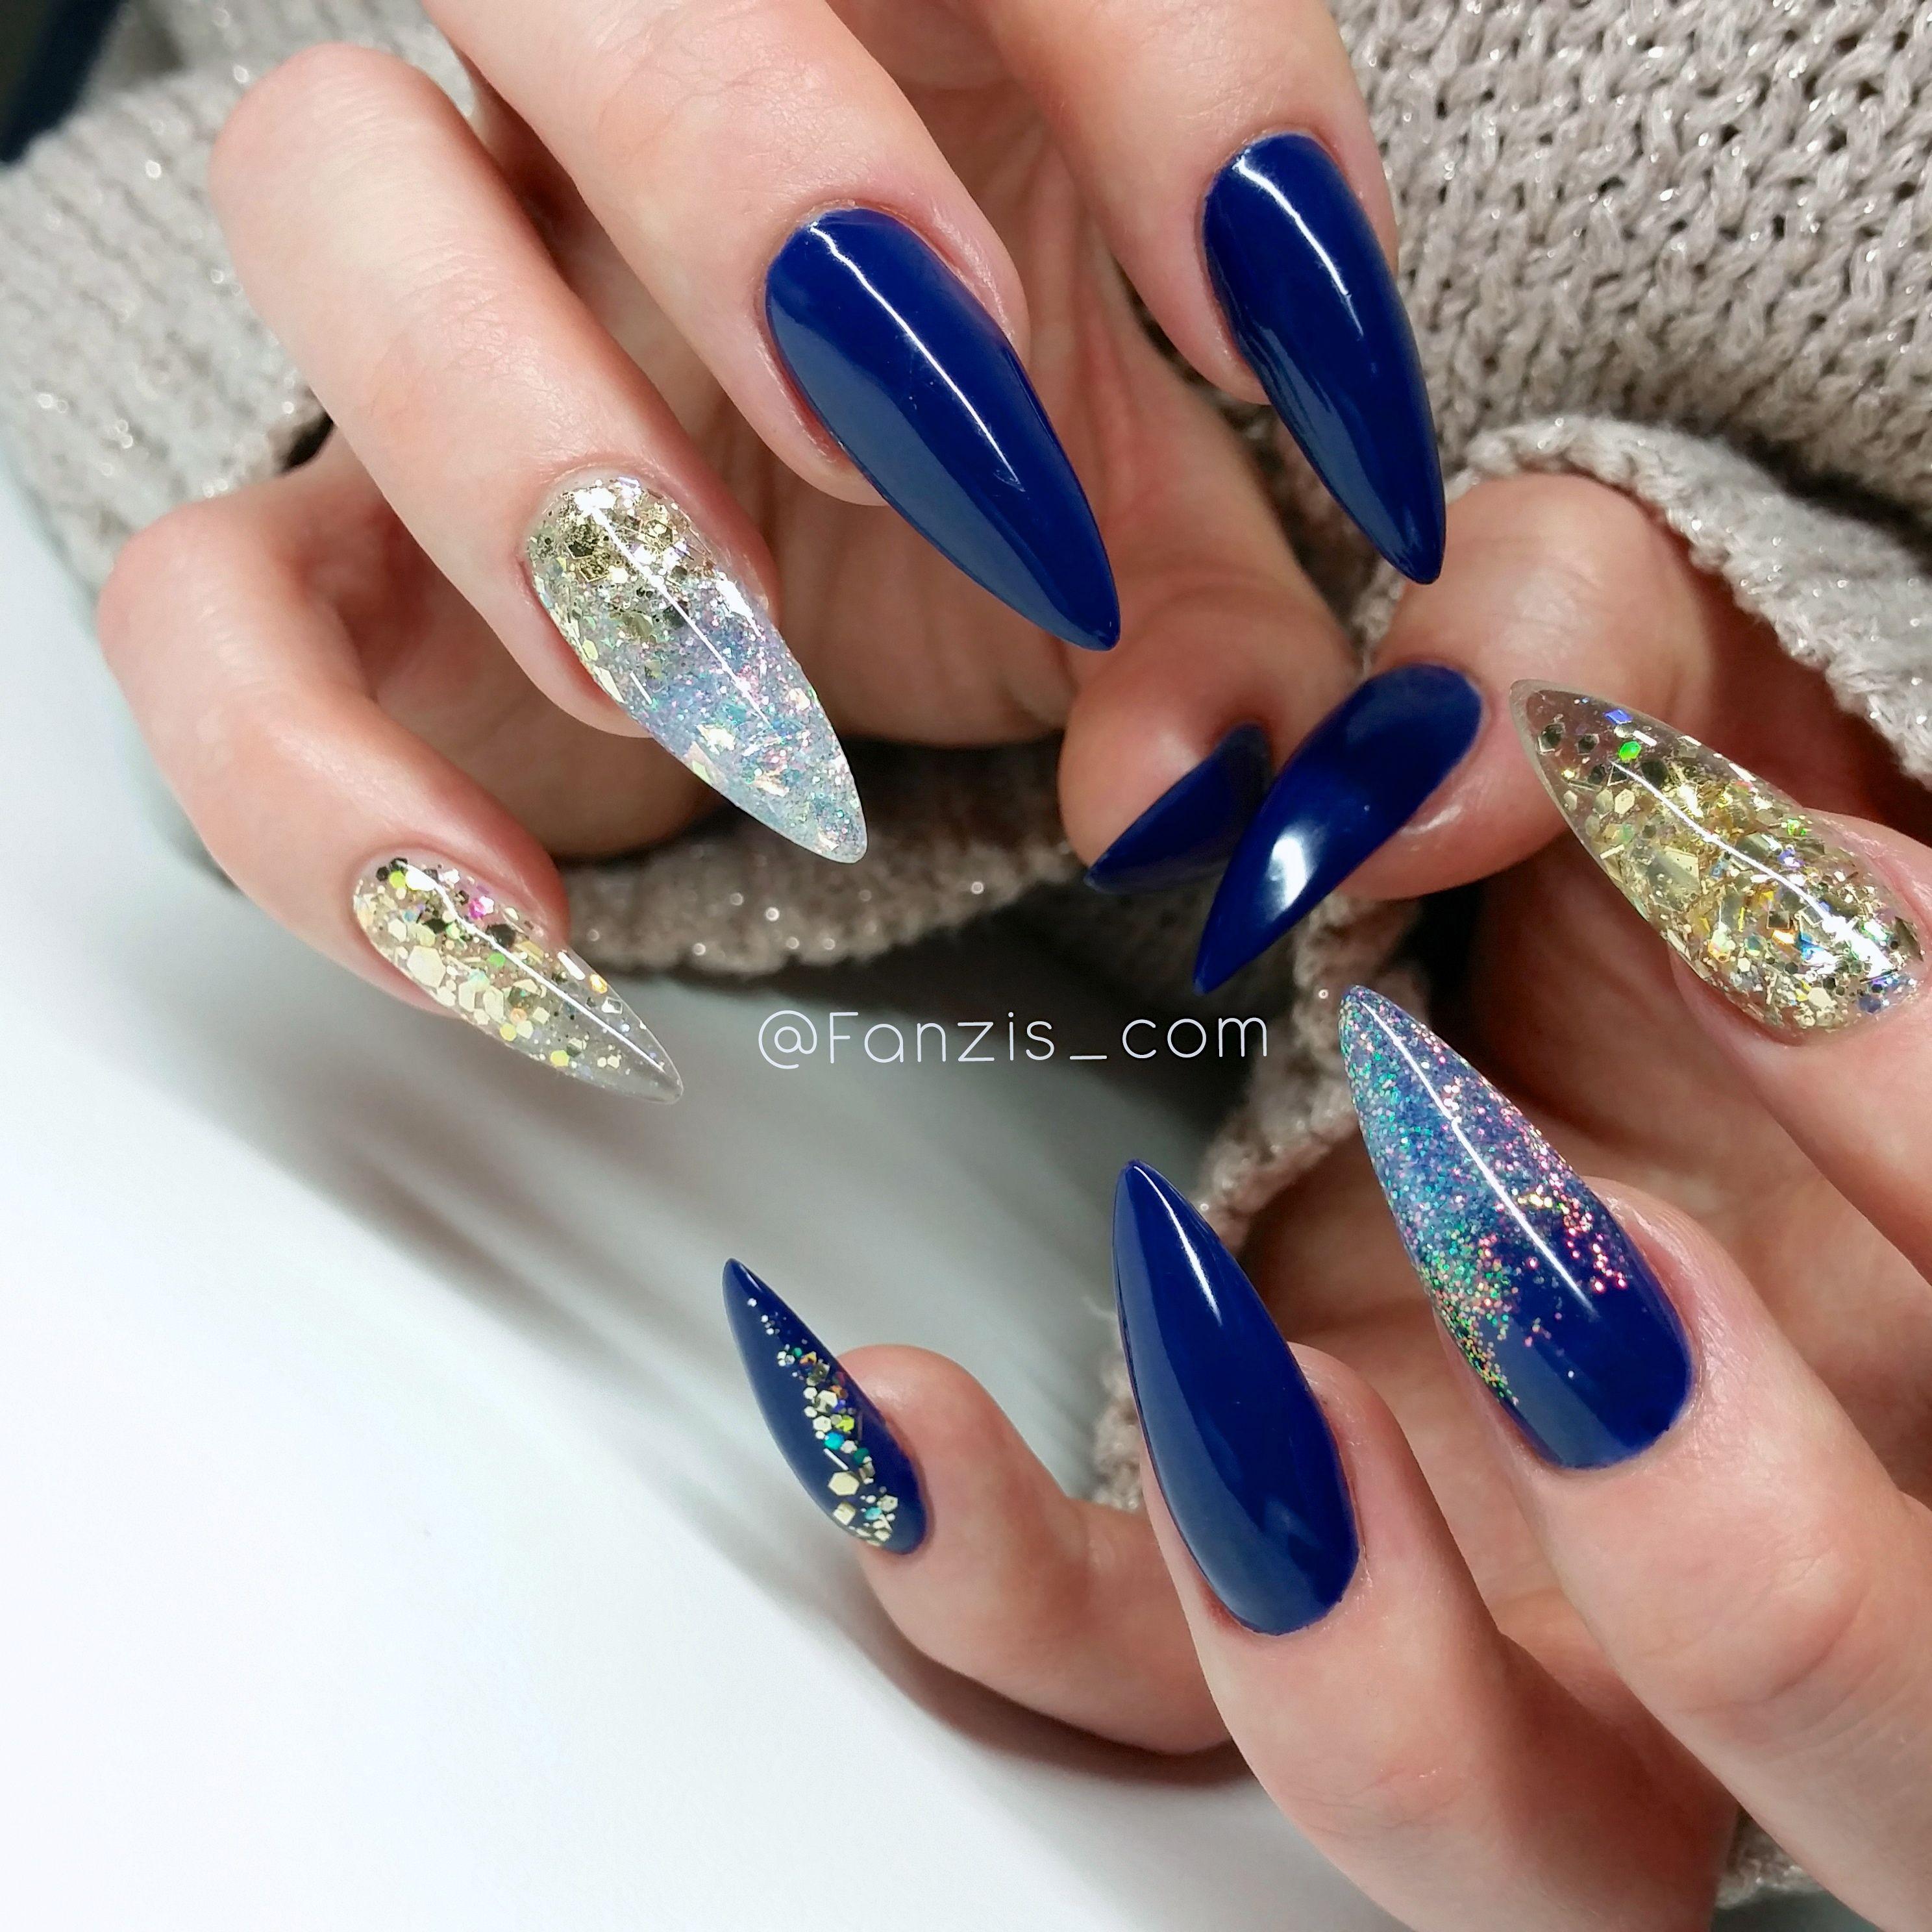 blue glitter nails   • N A I L S • Ig @fanzis_com   Pinterest ...